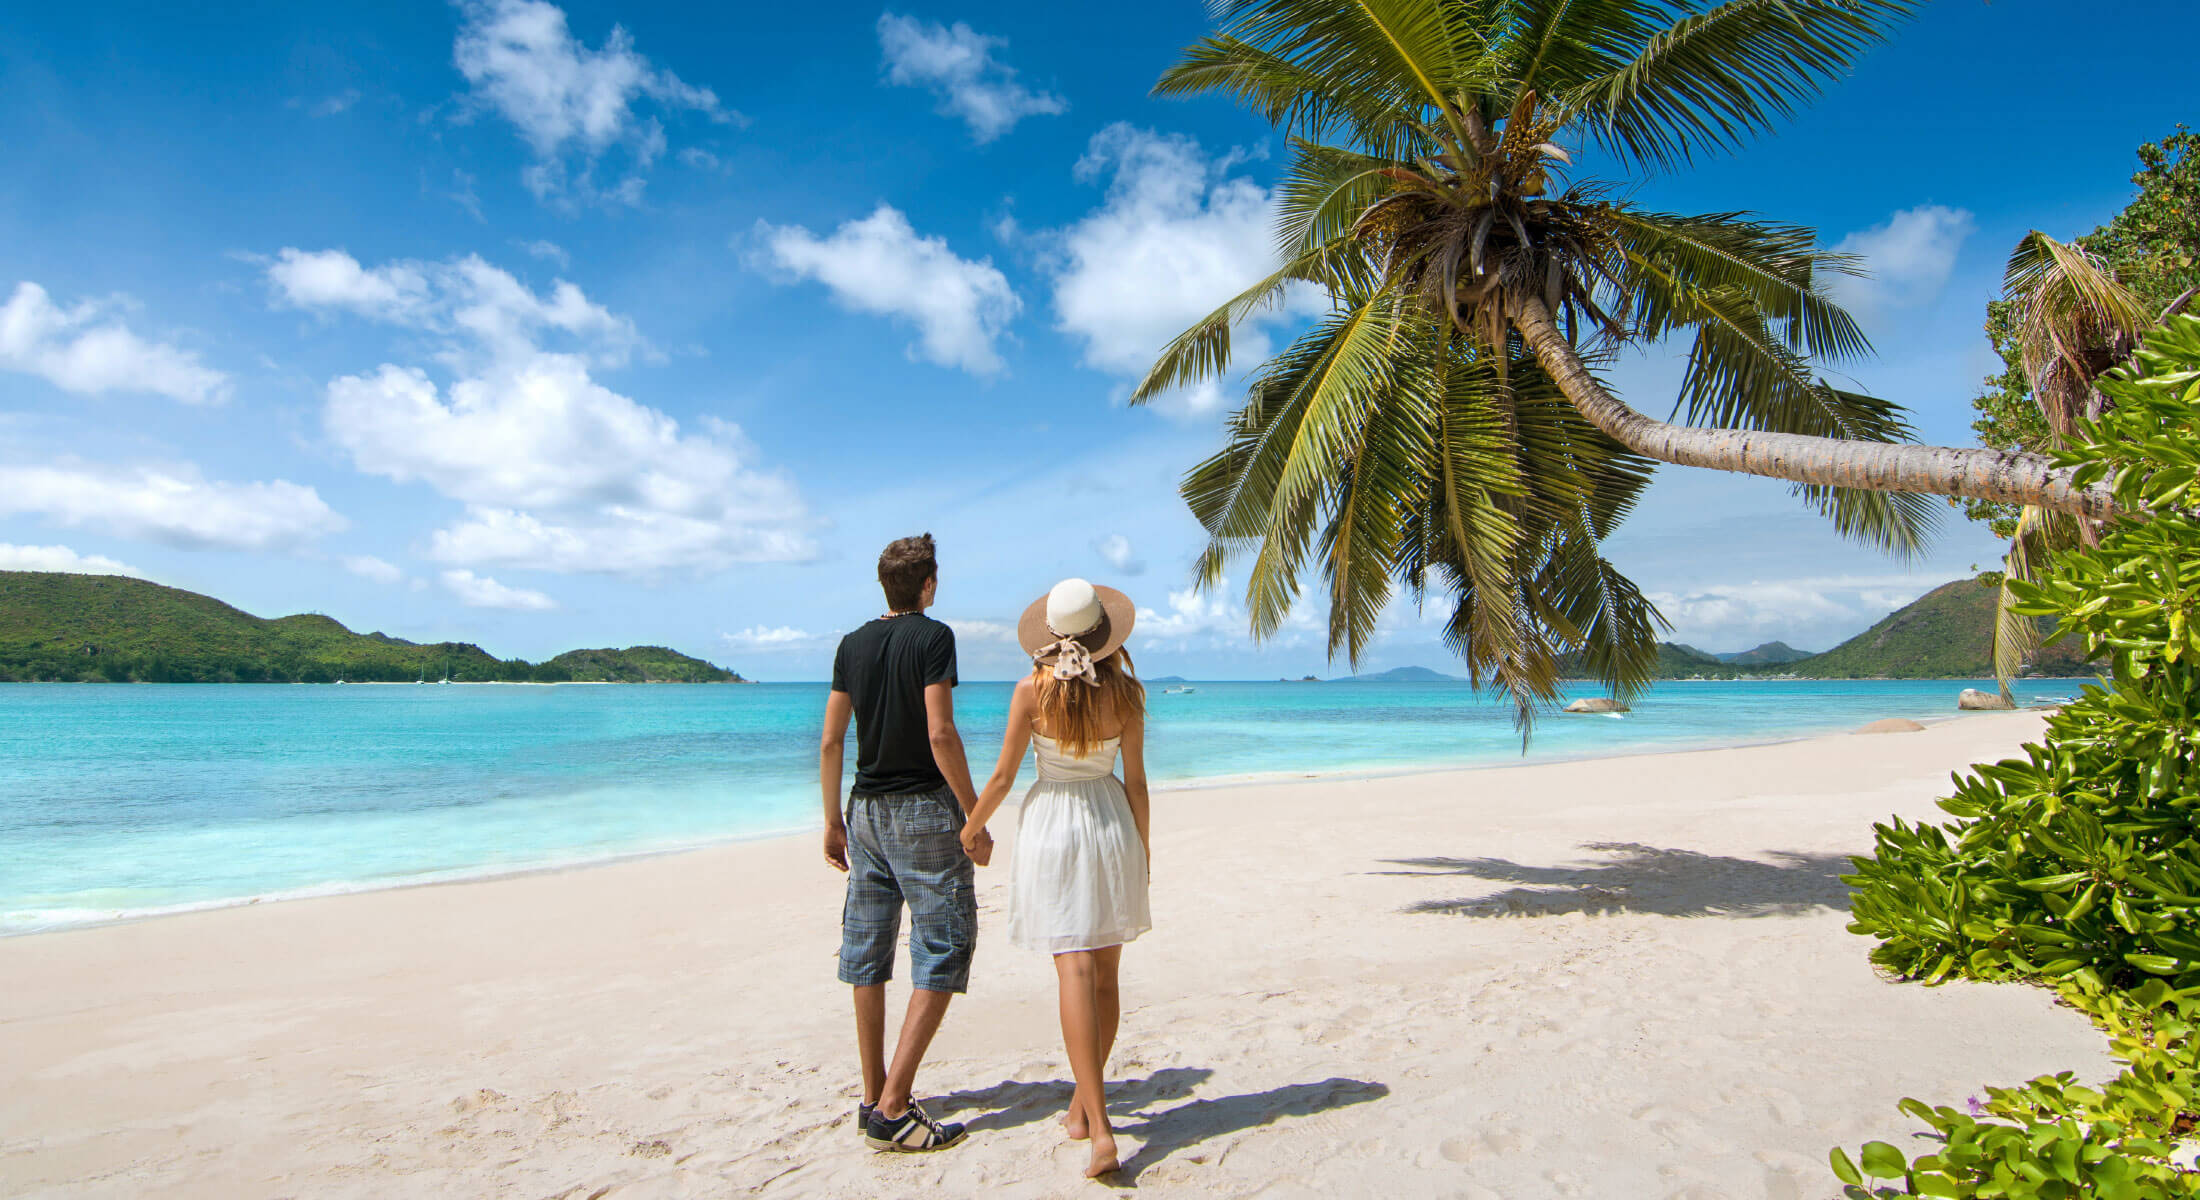 Couple wandering along tropical beach